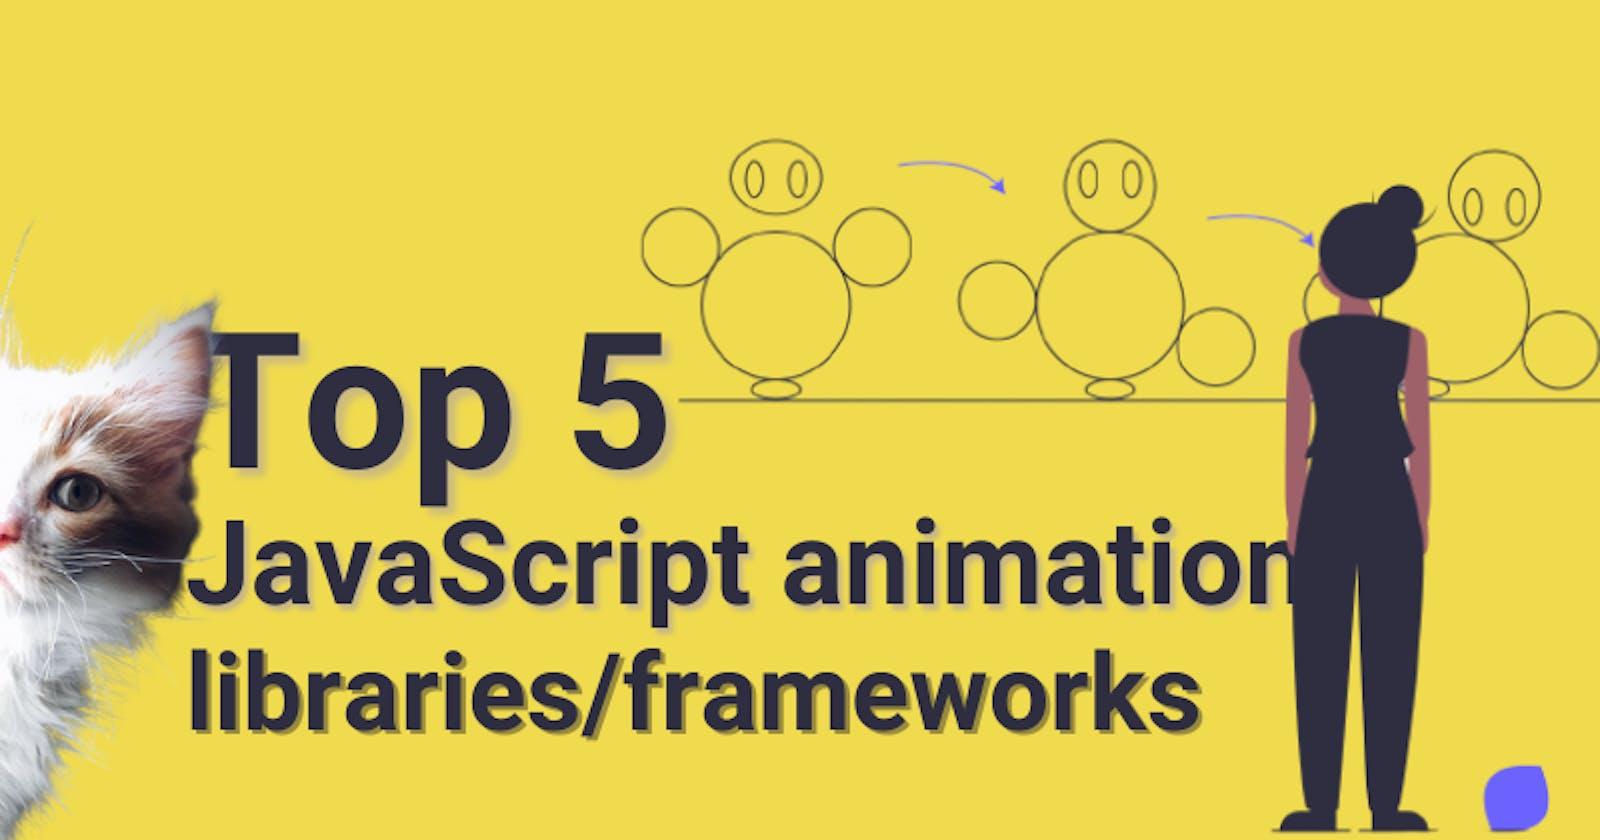 Top 5 JavaScript animation libraries 2021